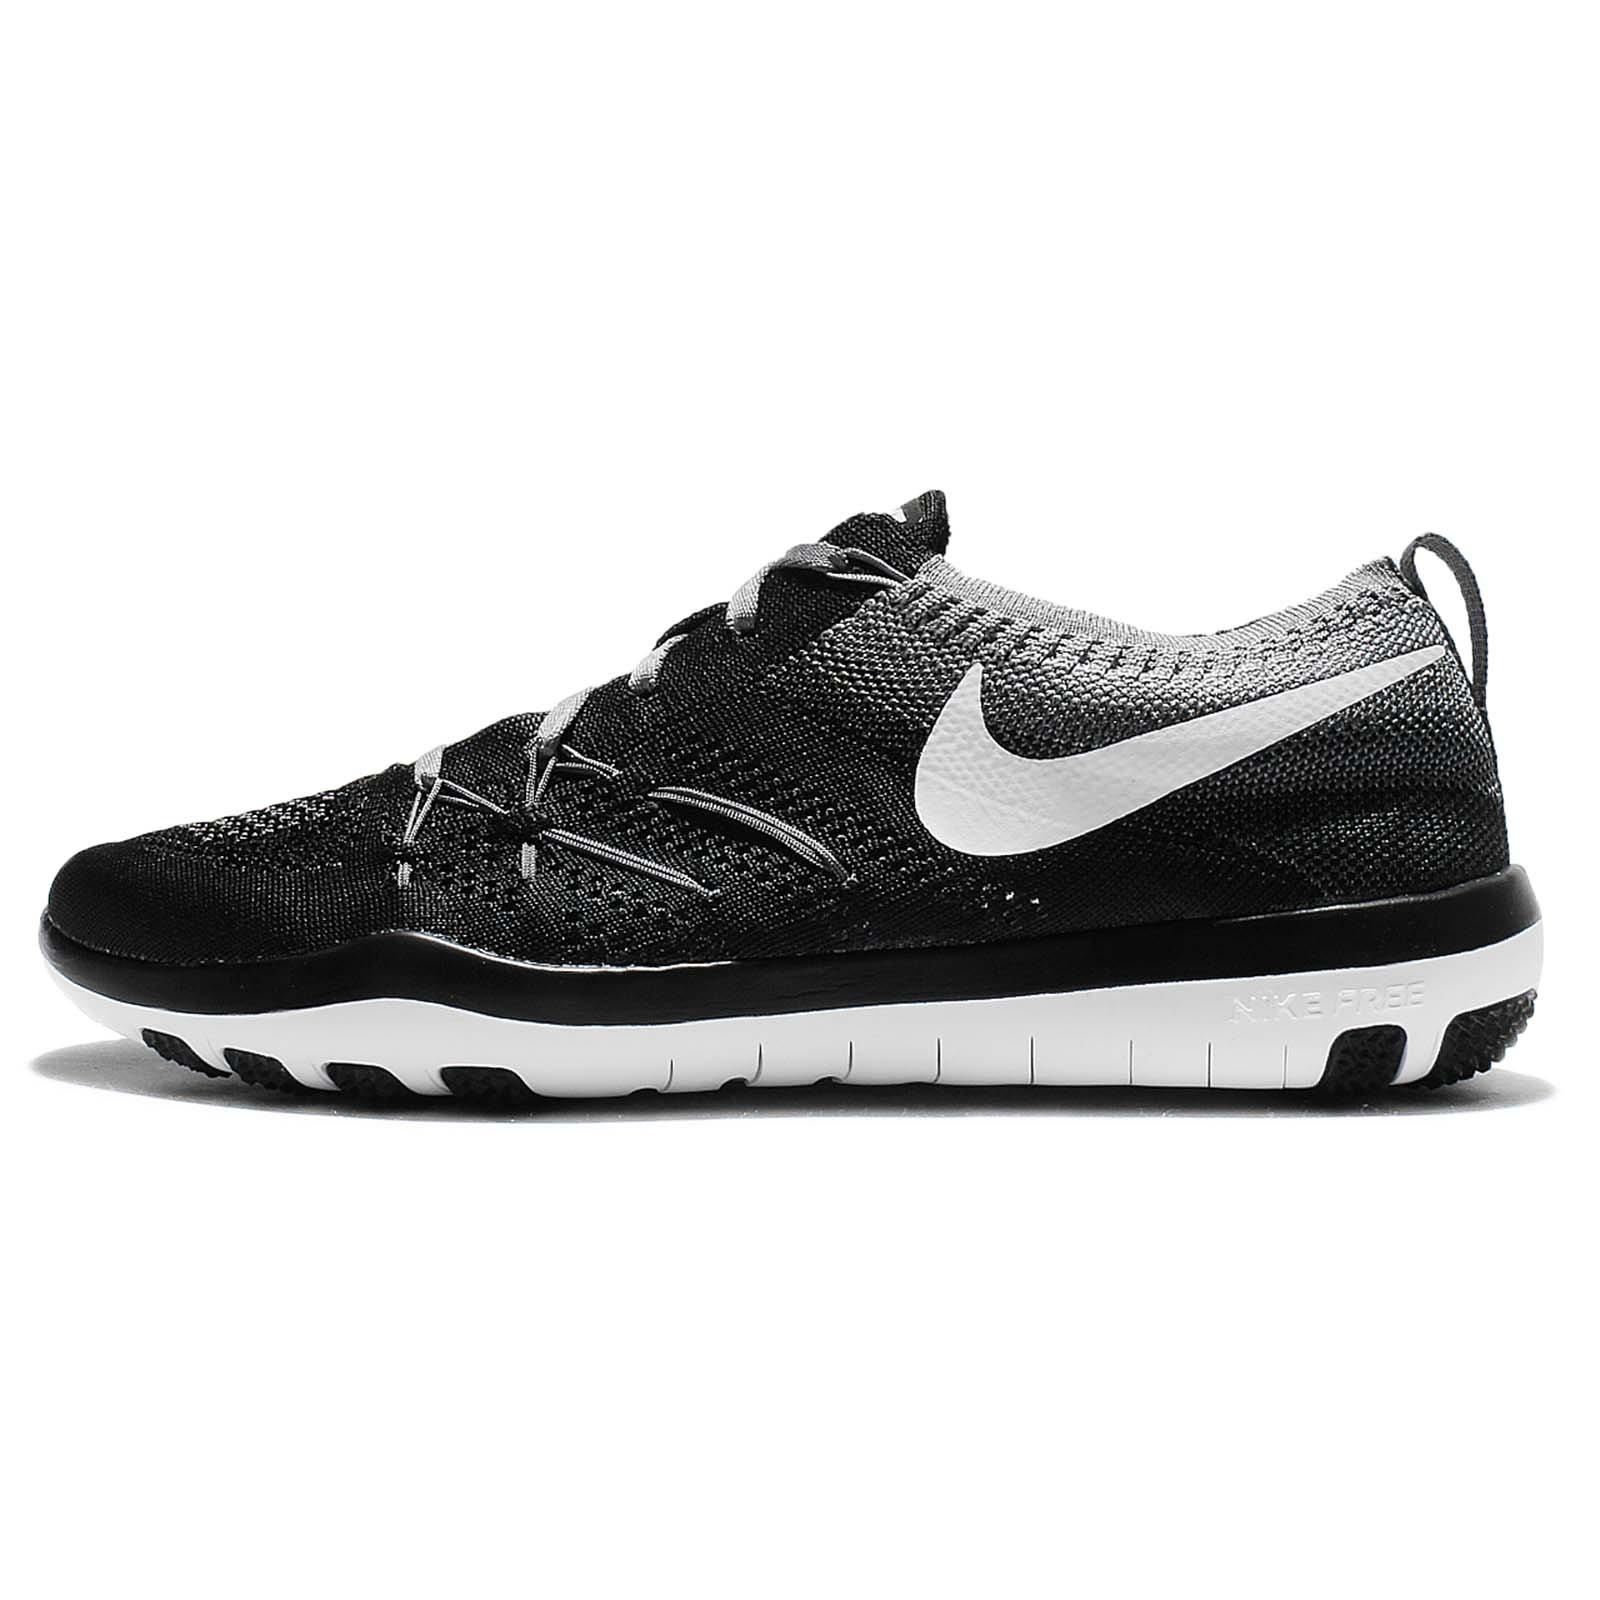 brand new 3c32c 1a92b Galleon - Nike Women s WMNS Free TR Focus Flyknit, Black White-Cool Grey,  5.5 M US